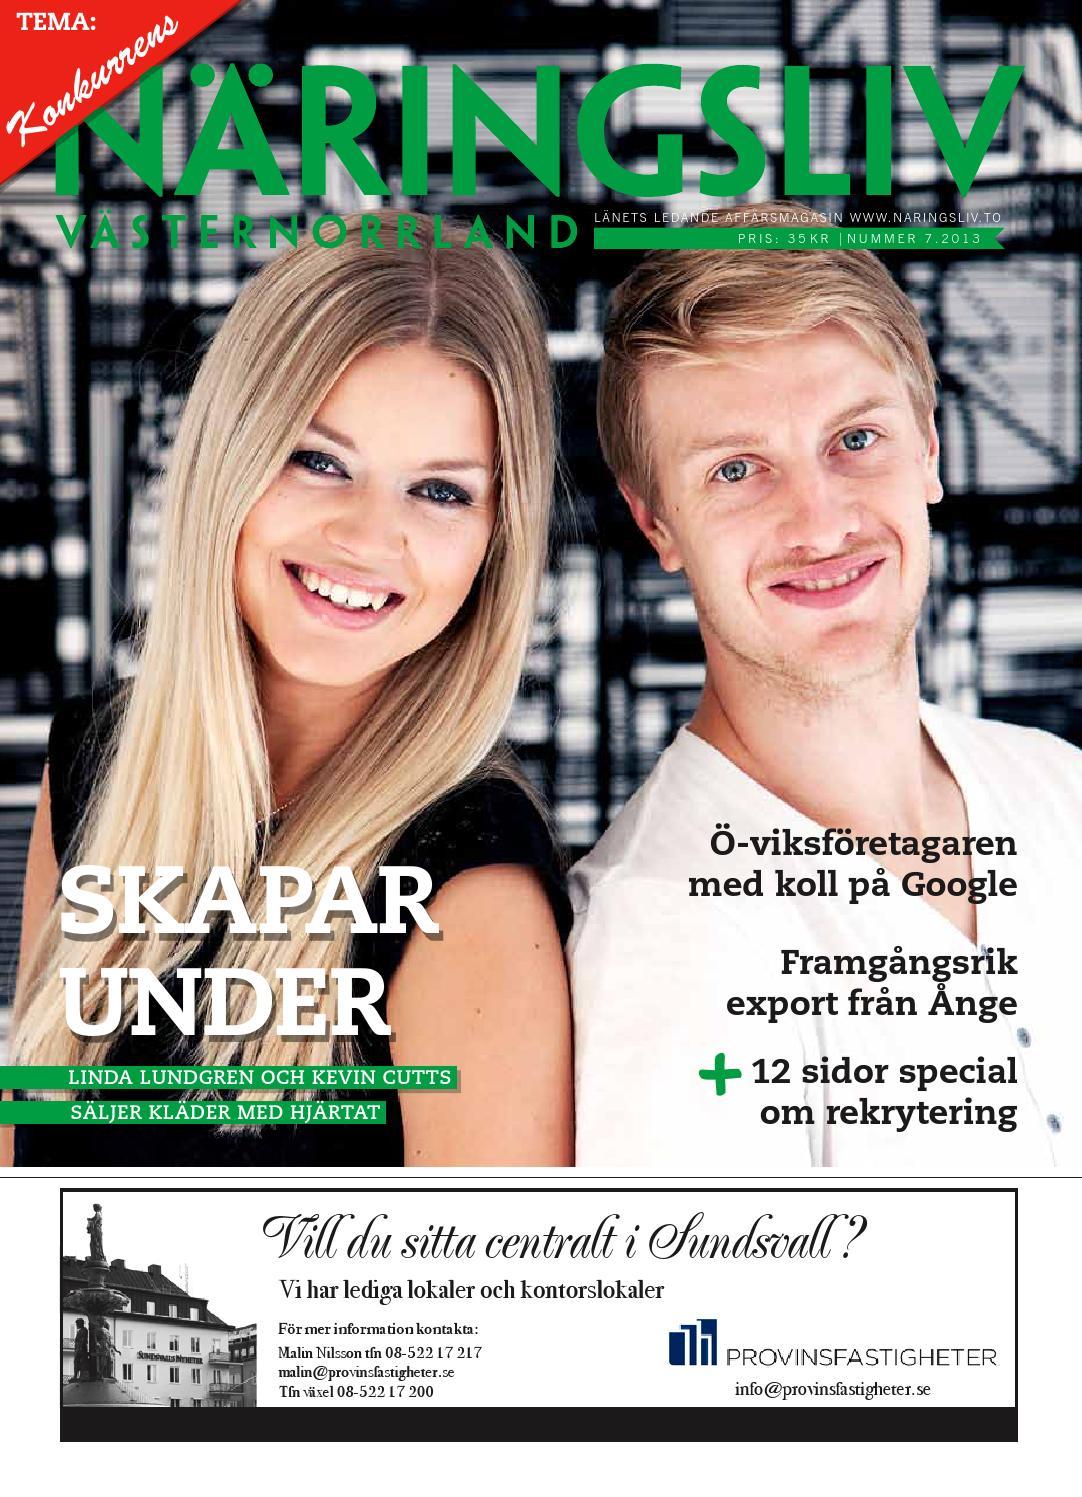 Näringsliv nr 5 2014 by Olof Axelsson - issuu